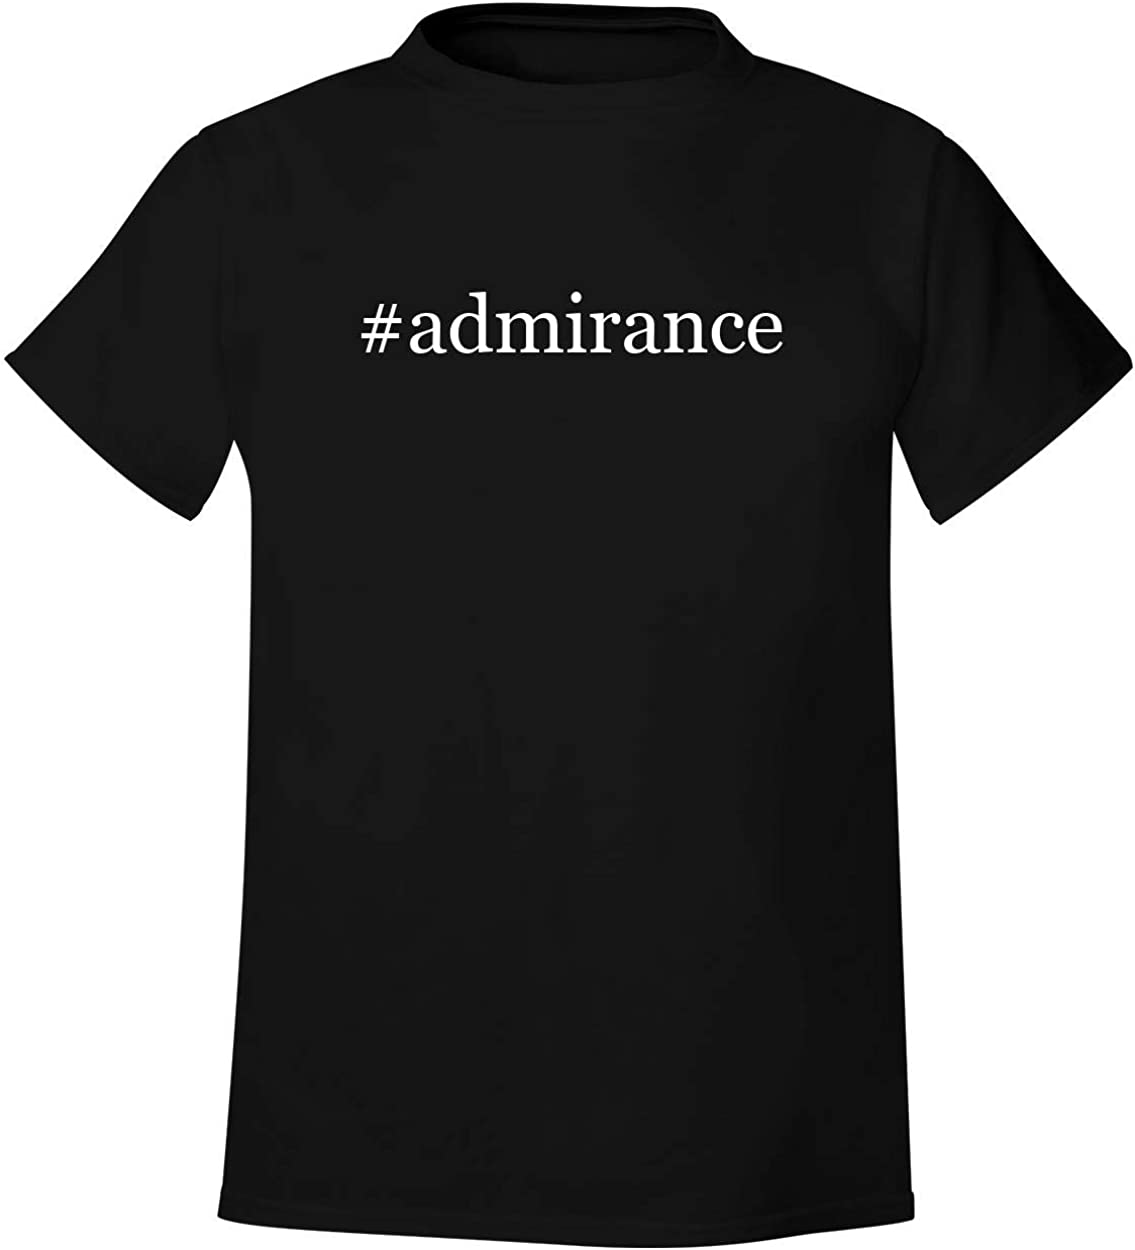 #admirance - Men's Hashtag Soft & Comfortable T-Shirt